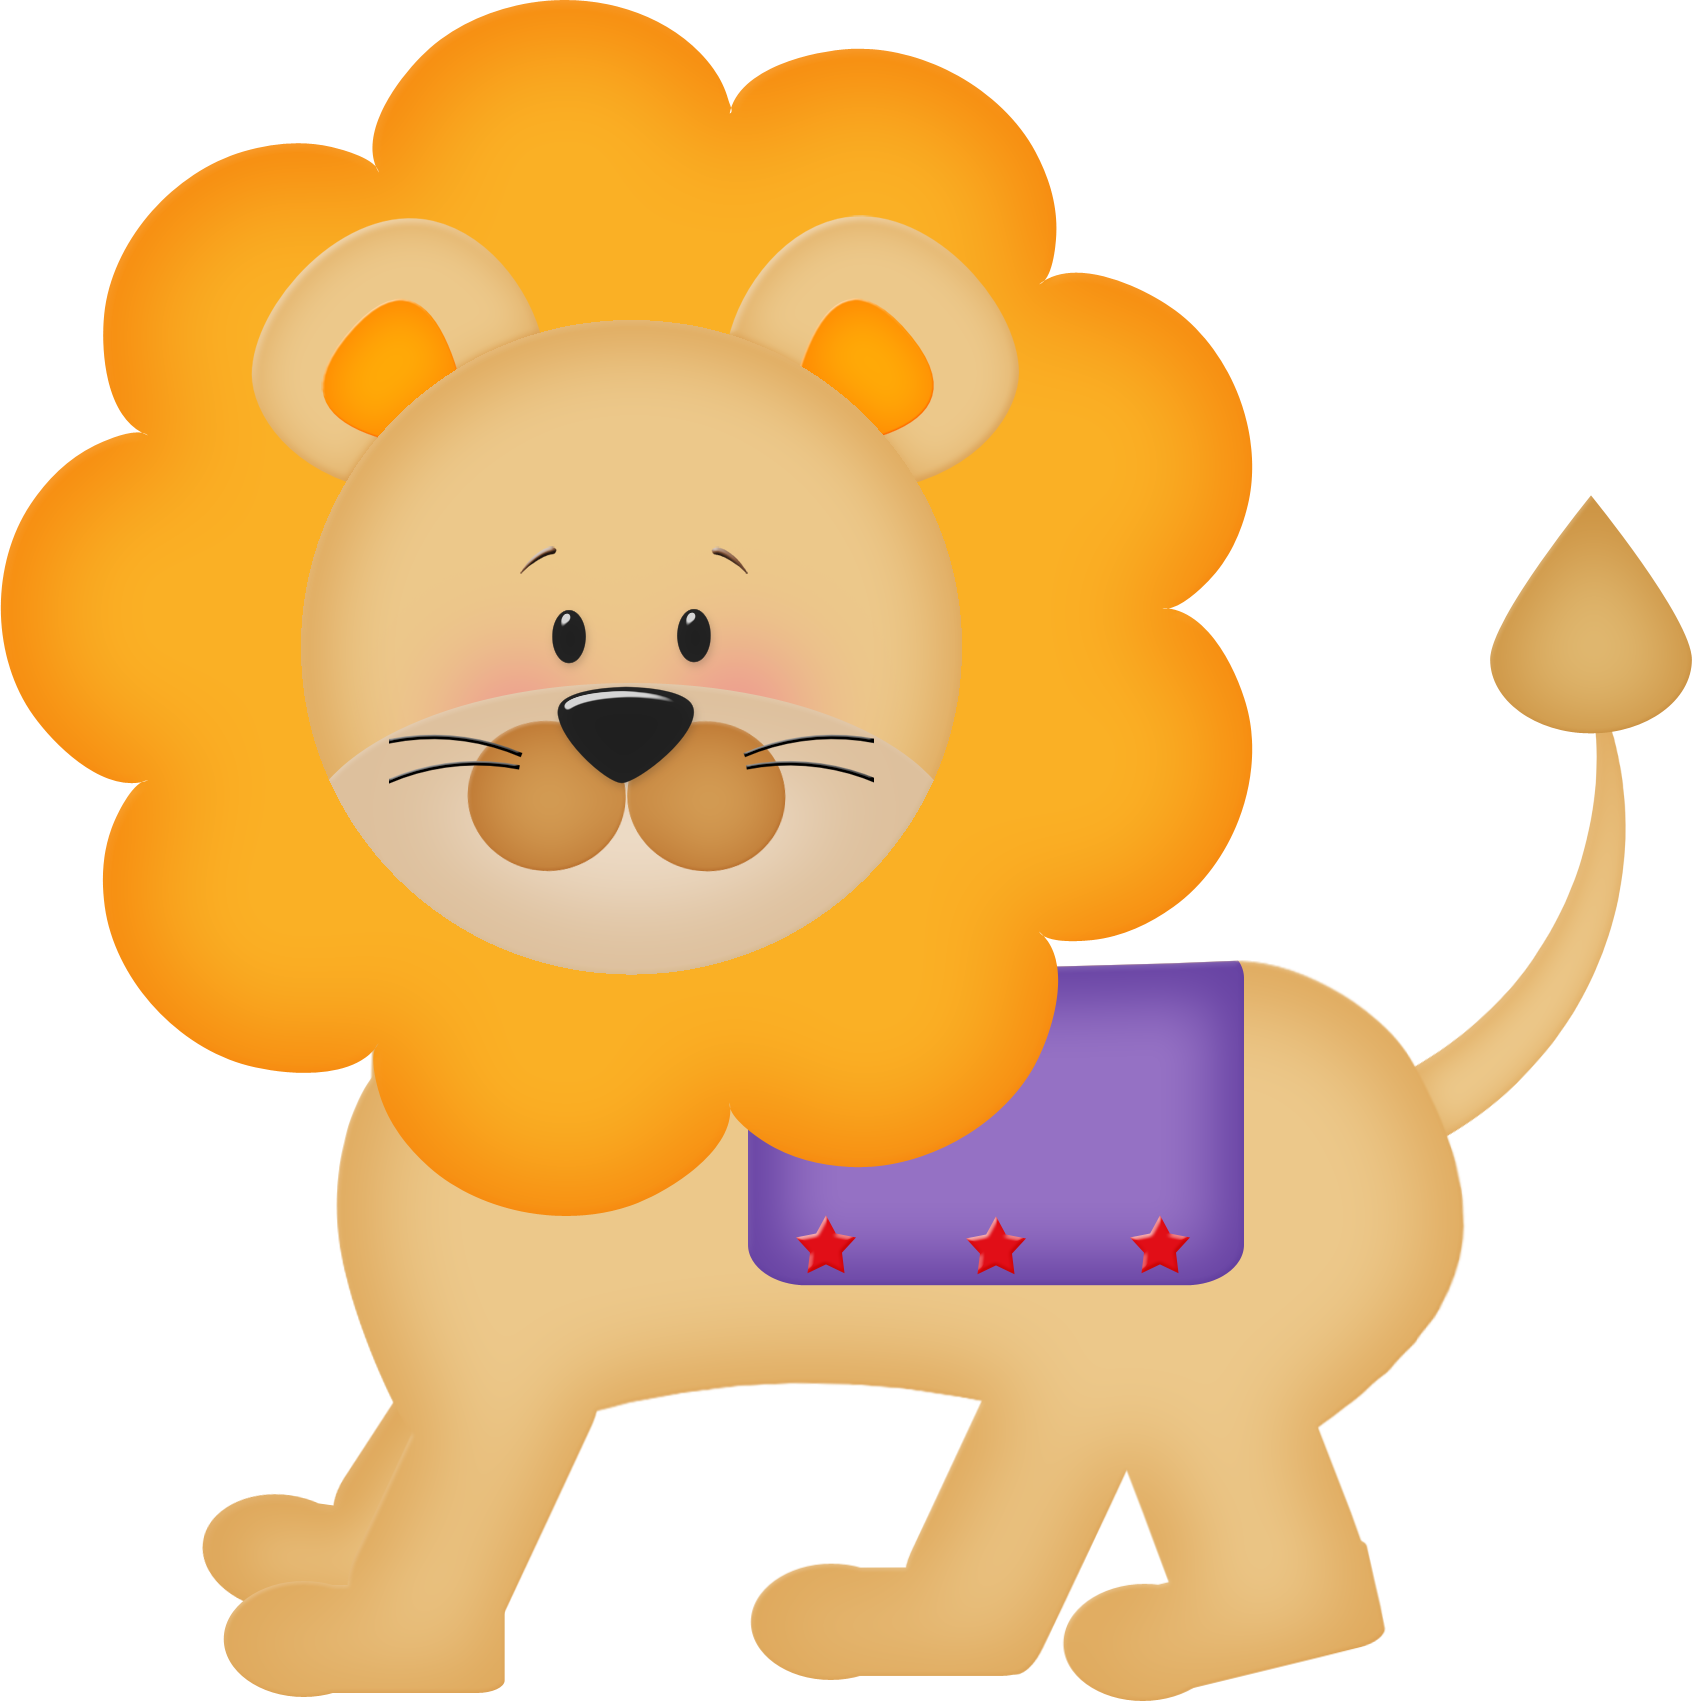 Clipart lion basketball, Clipart lion basketball Transparent FREE for  download on WebStockReview 2020